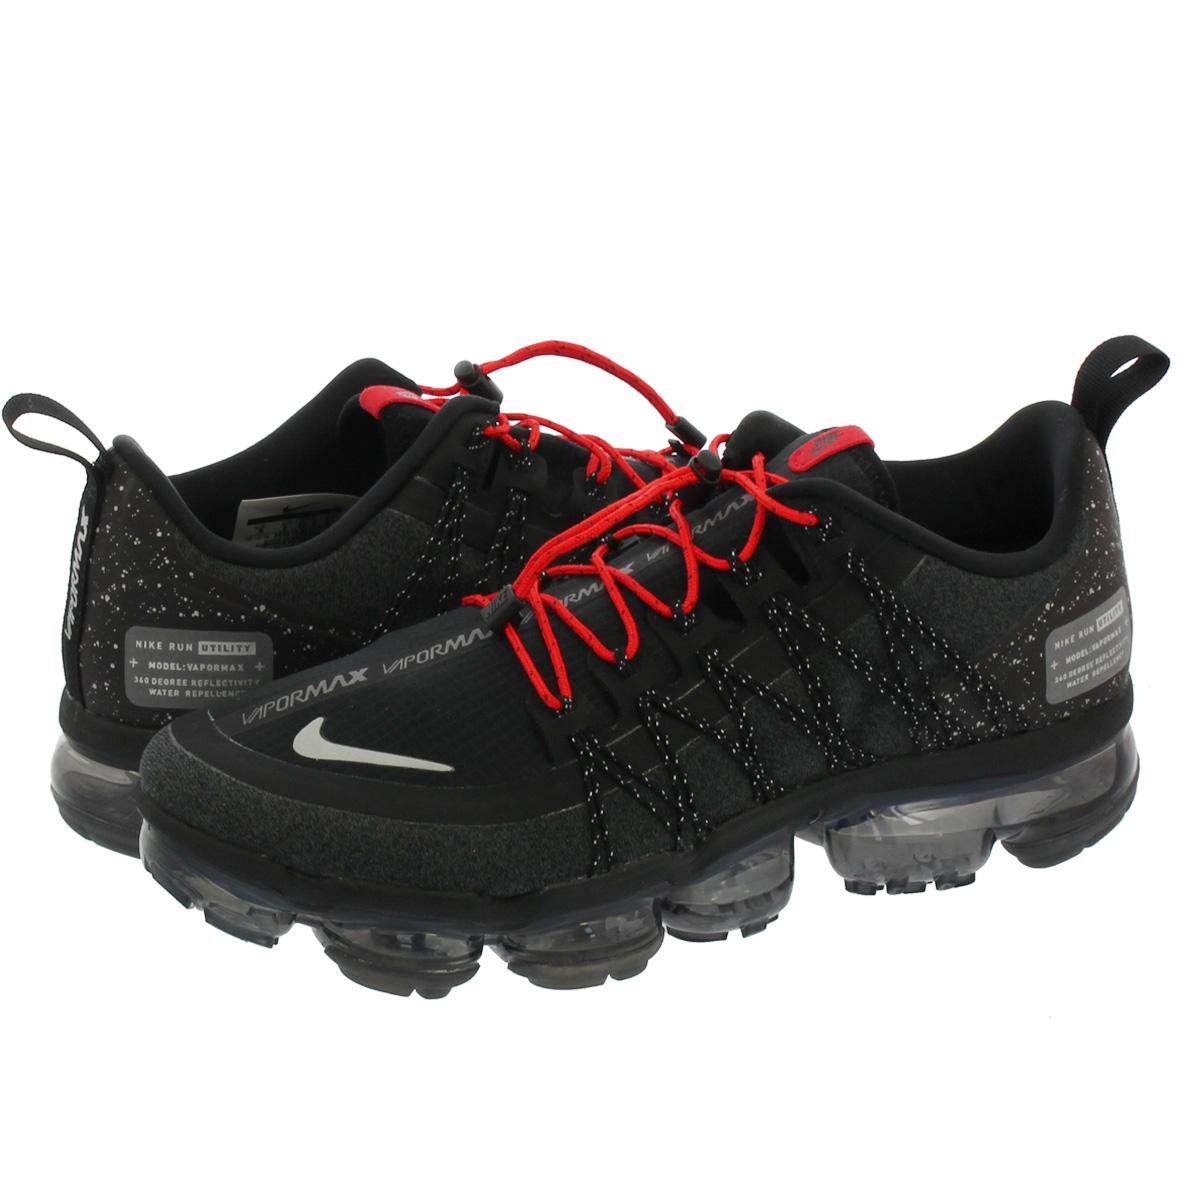 09b7f2e5ee NIKE AIR VAPORMAX RUN UTILITY Nike vapor max orchid utility BLACK/REFLECT  SILVER/ANTHRACITE ...